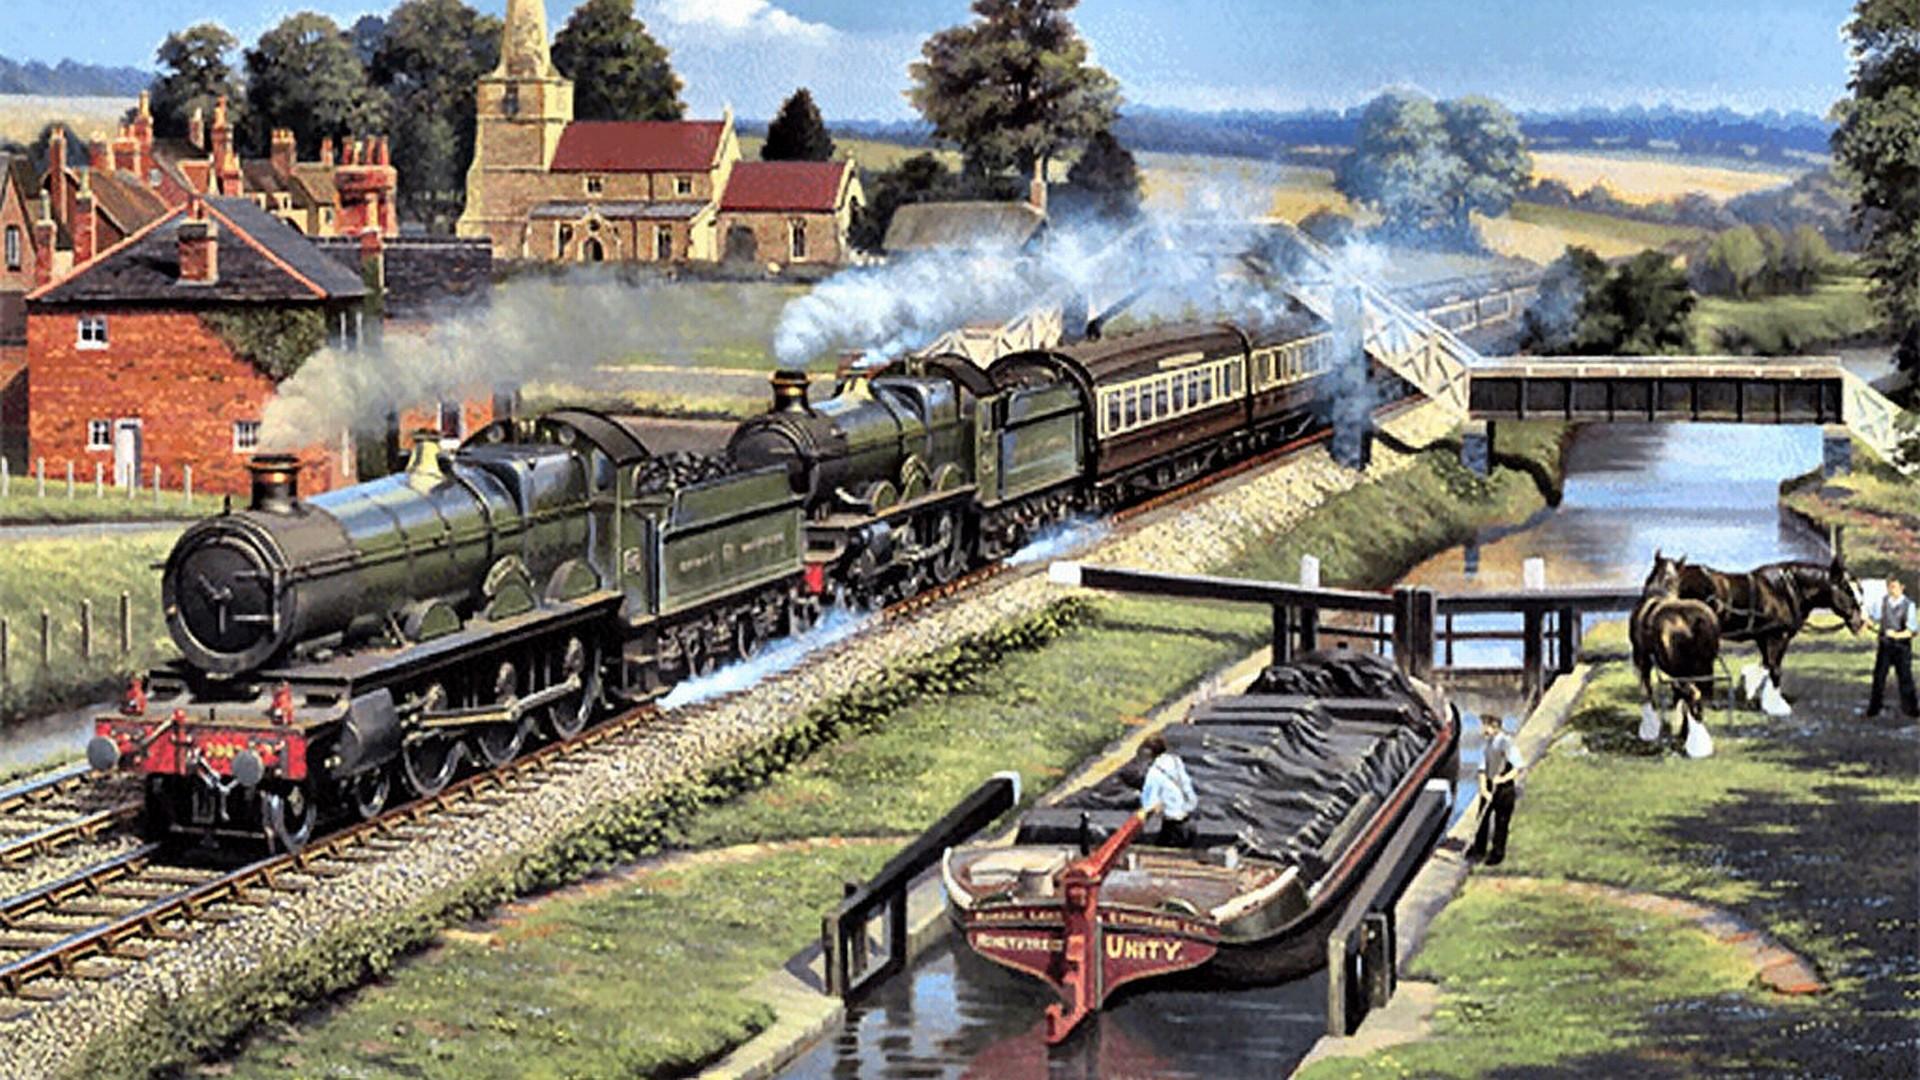 Train Vehicles Full HD Wallpaper Free Download